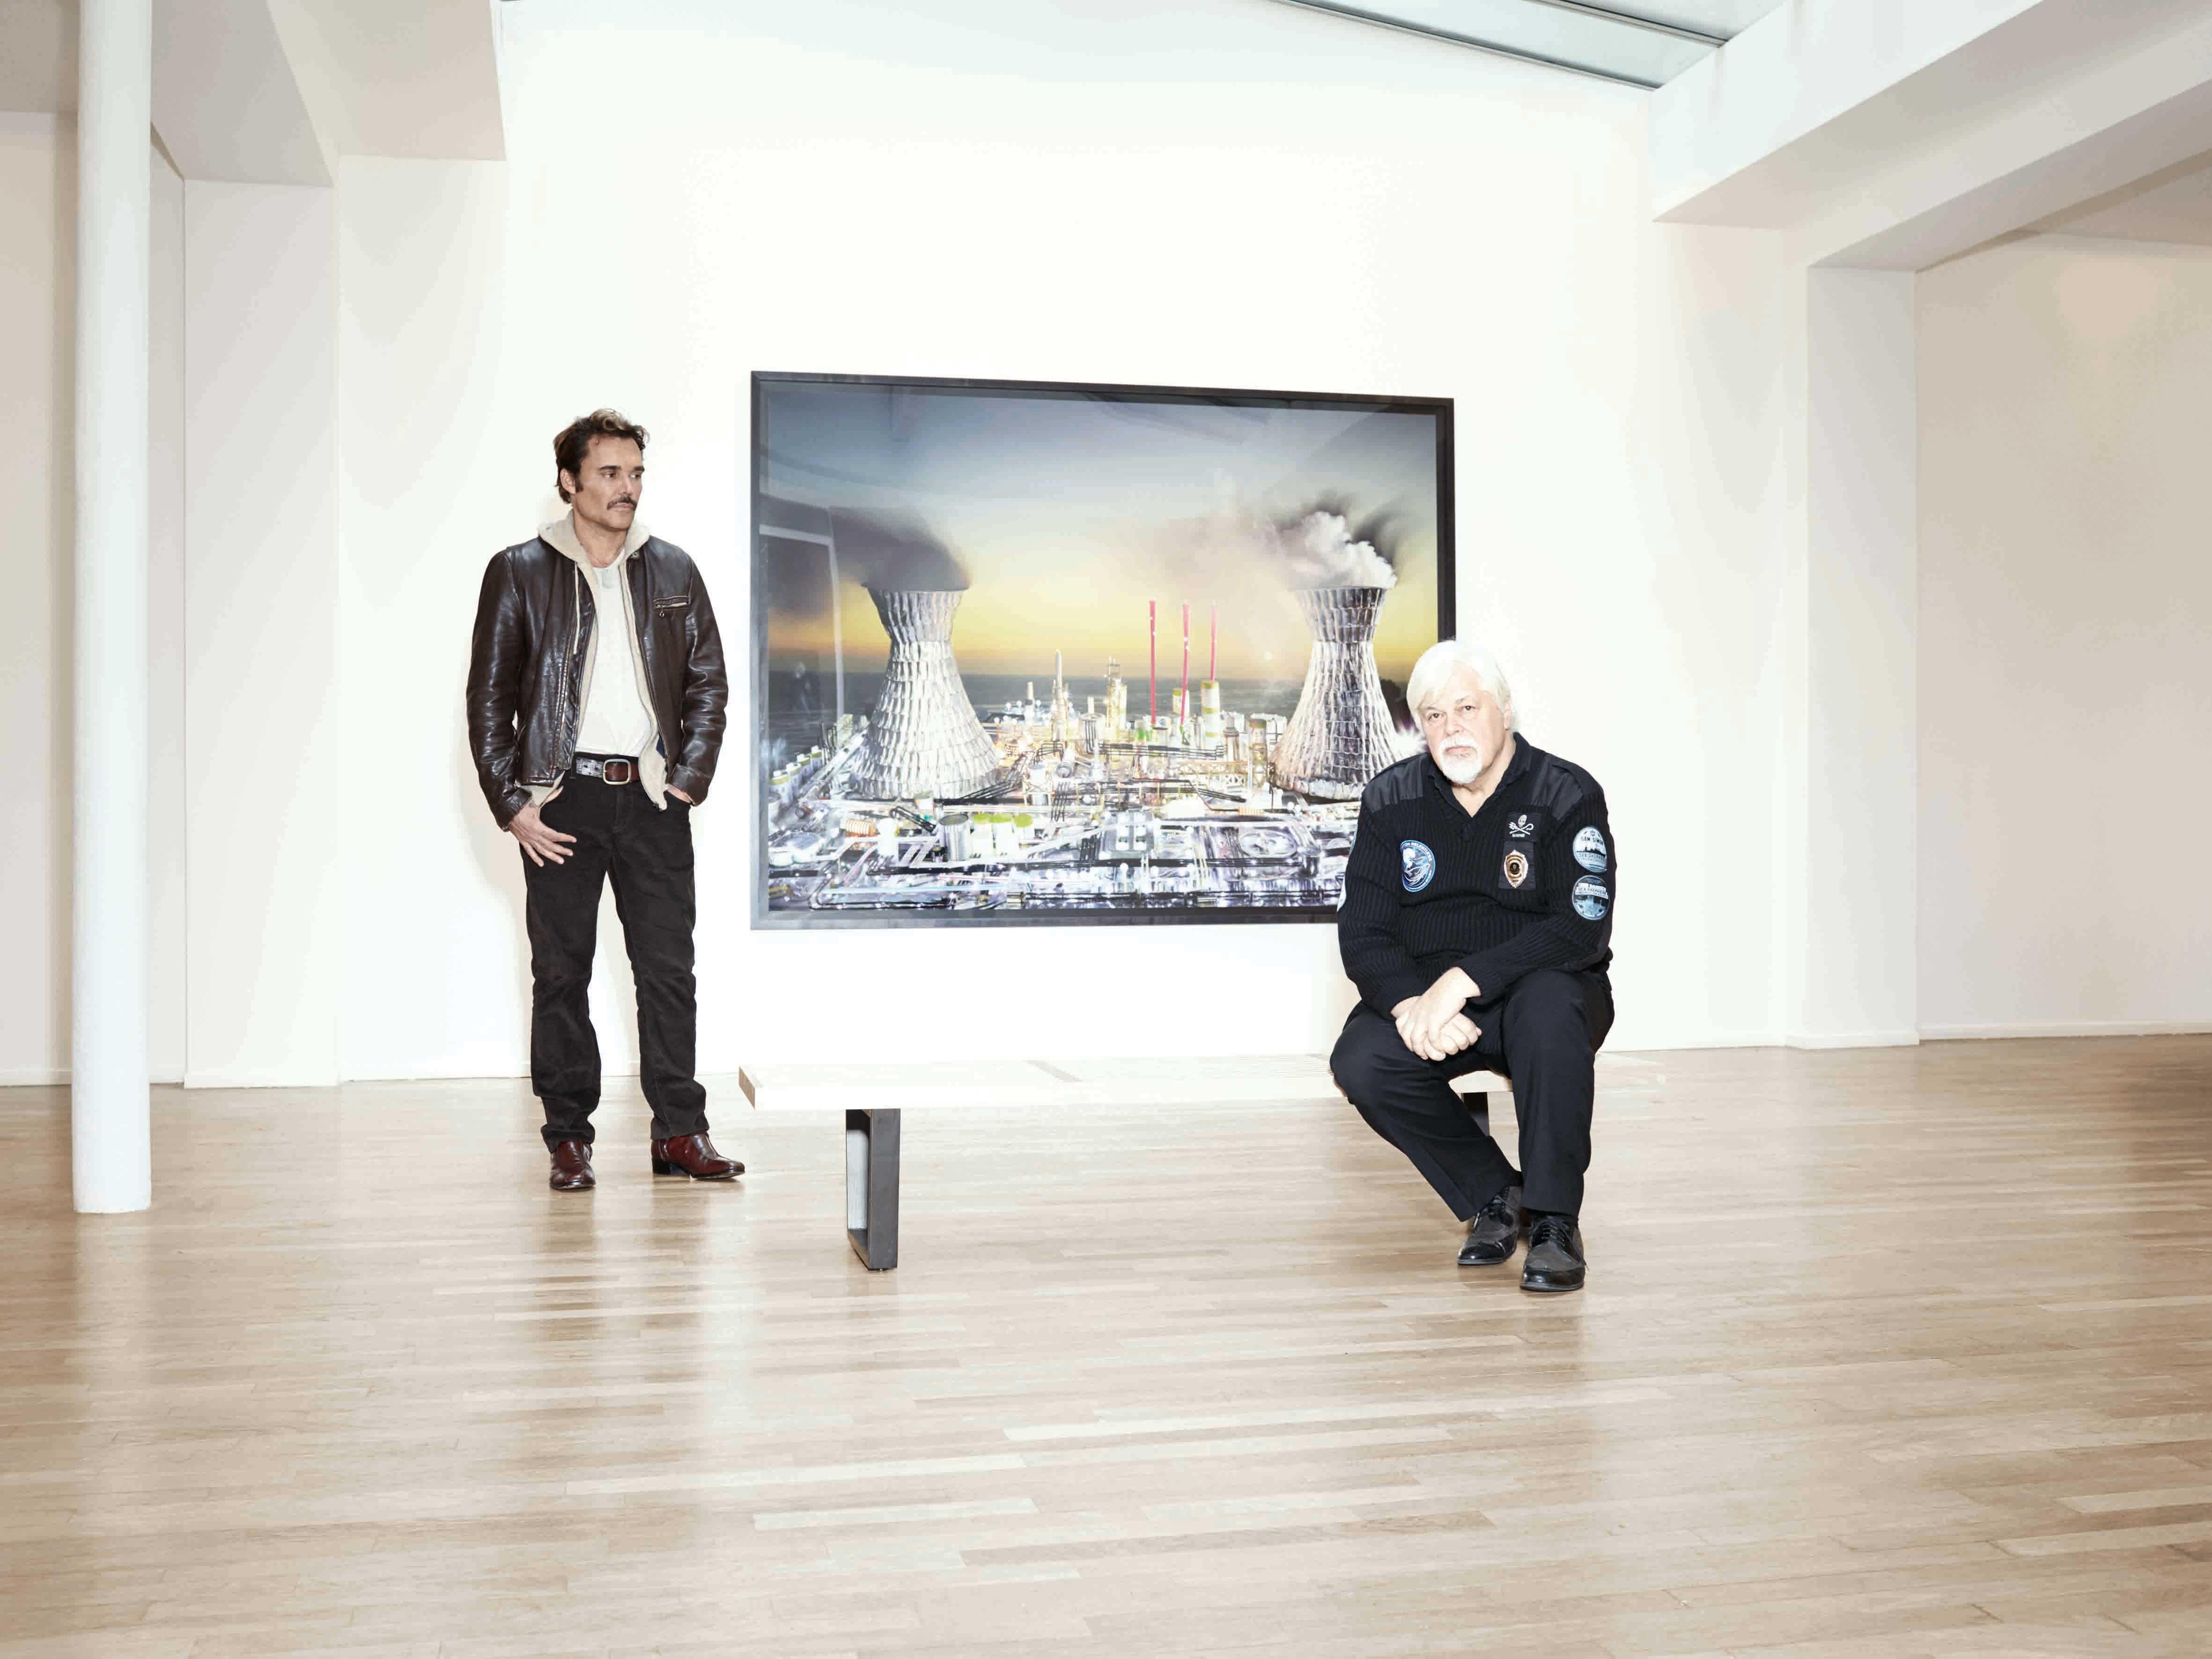 BEST OF 2015: Julian Schnabel, Paul Watson, David LaChapelle and Cyrill Gutsch... 4 personalities fighting for a better world